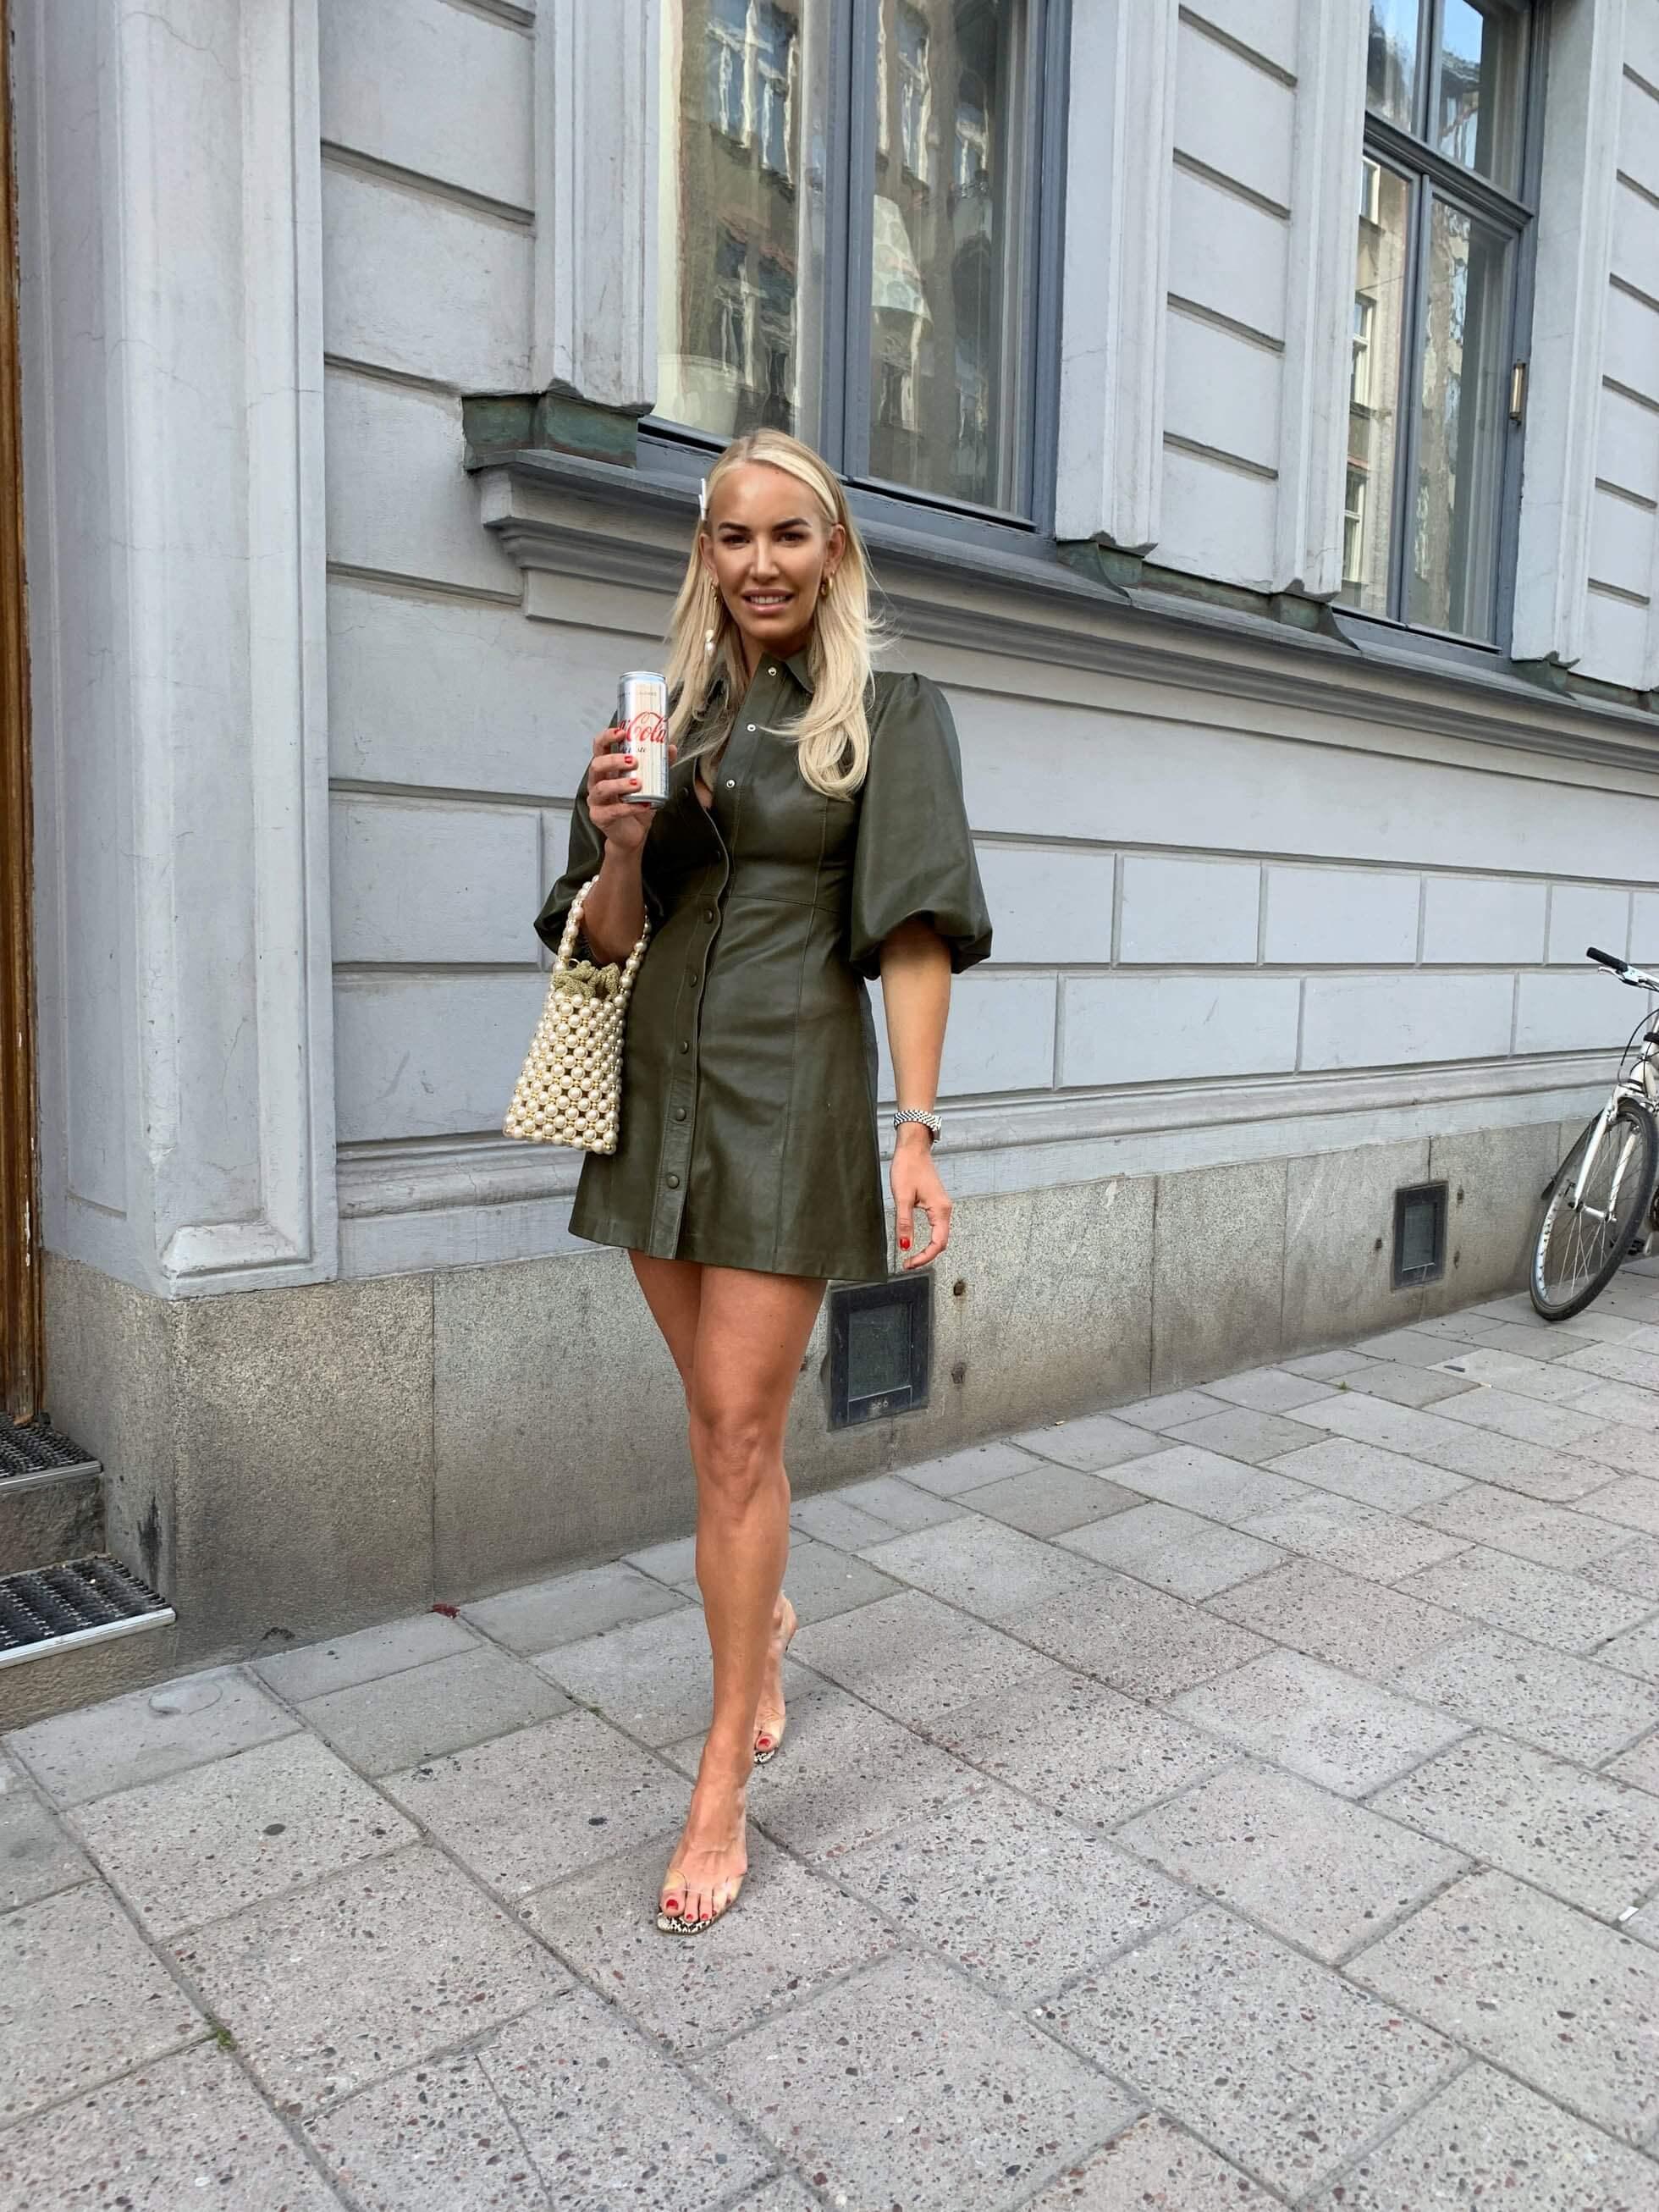 petratungardenblogg-23_pp